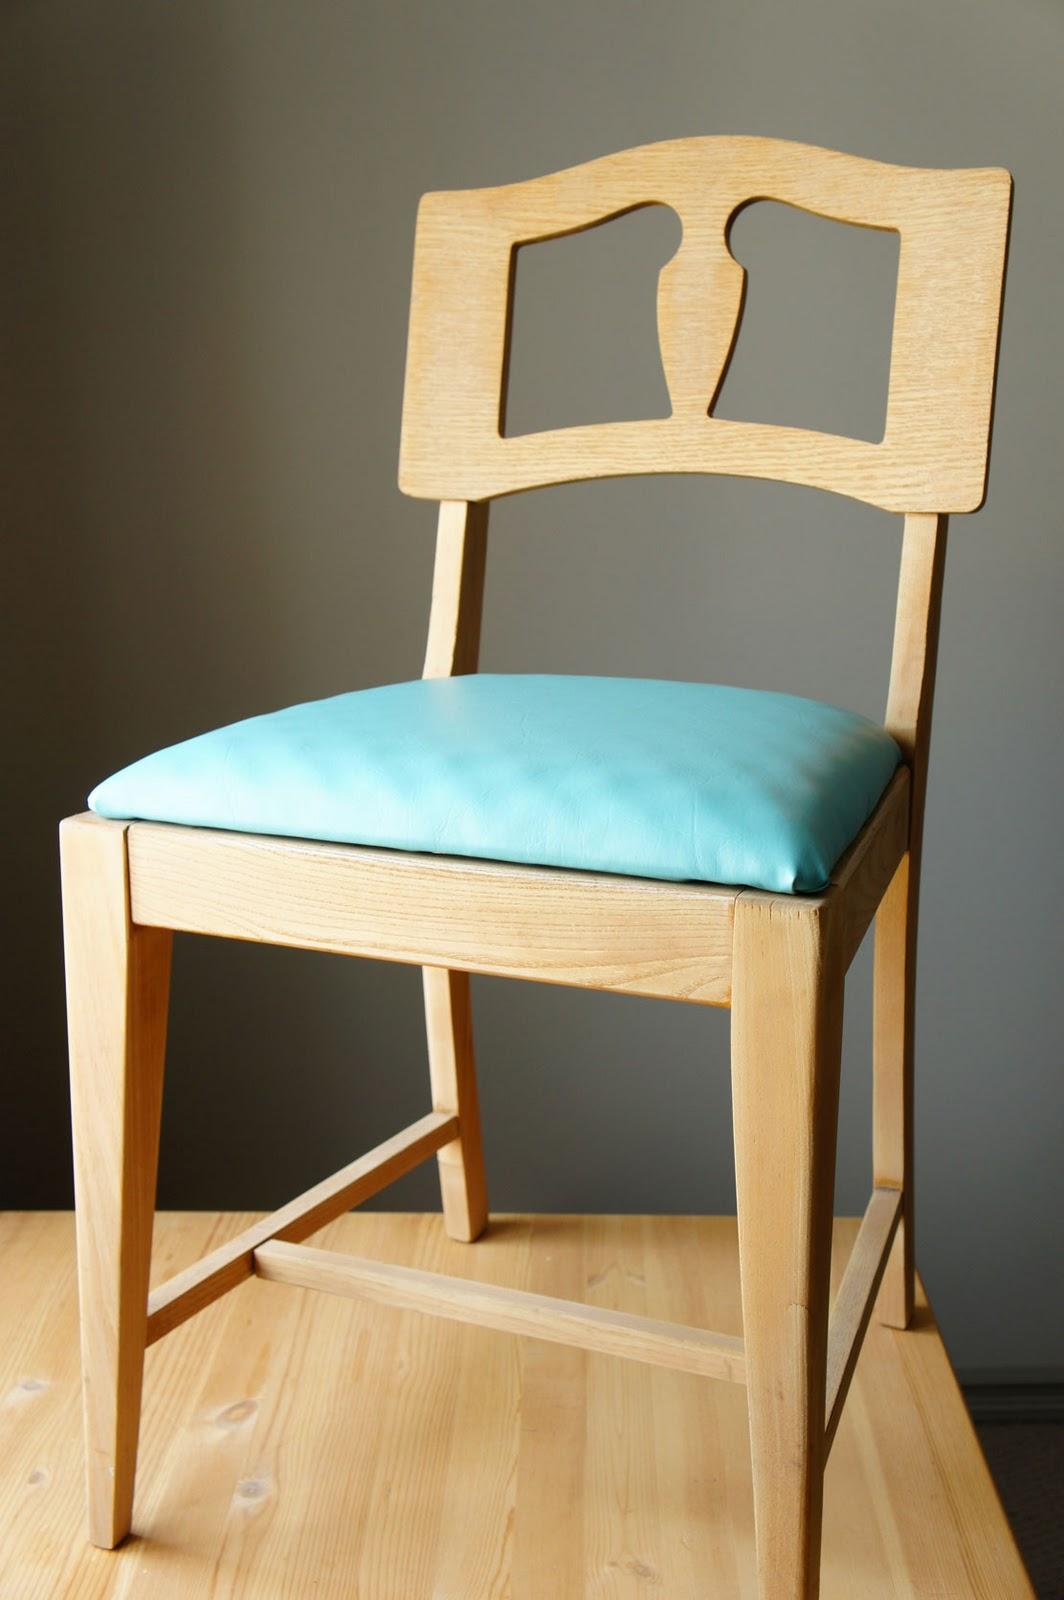 i d l e w i f e : DIY: recovering a chair seat